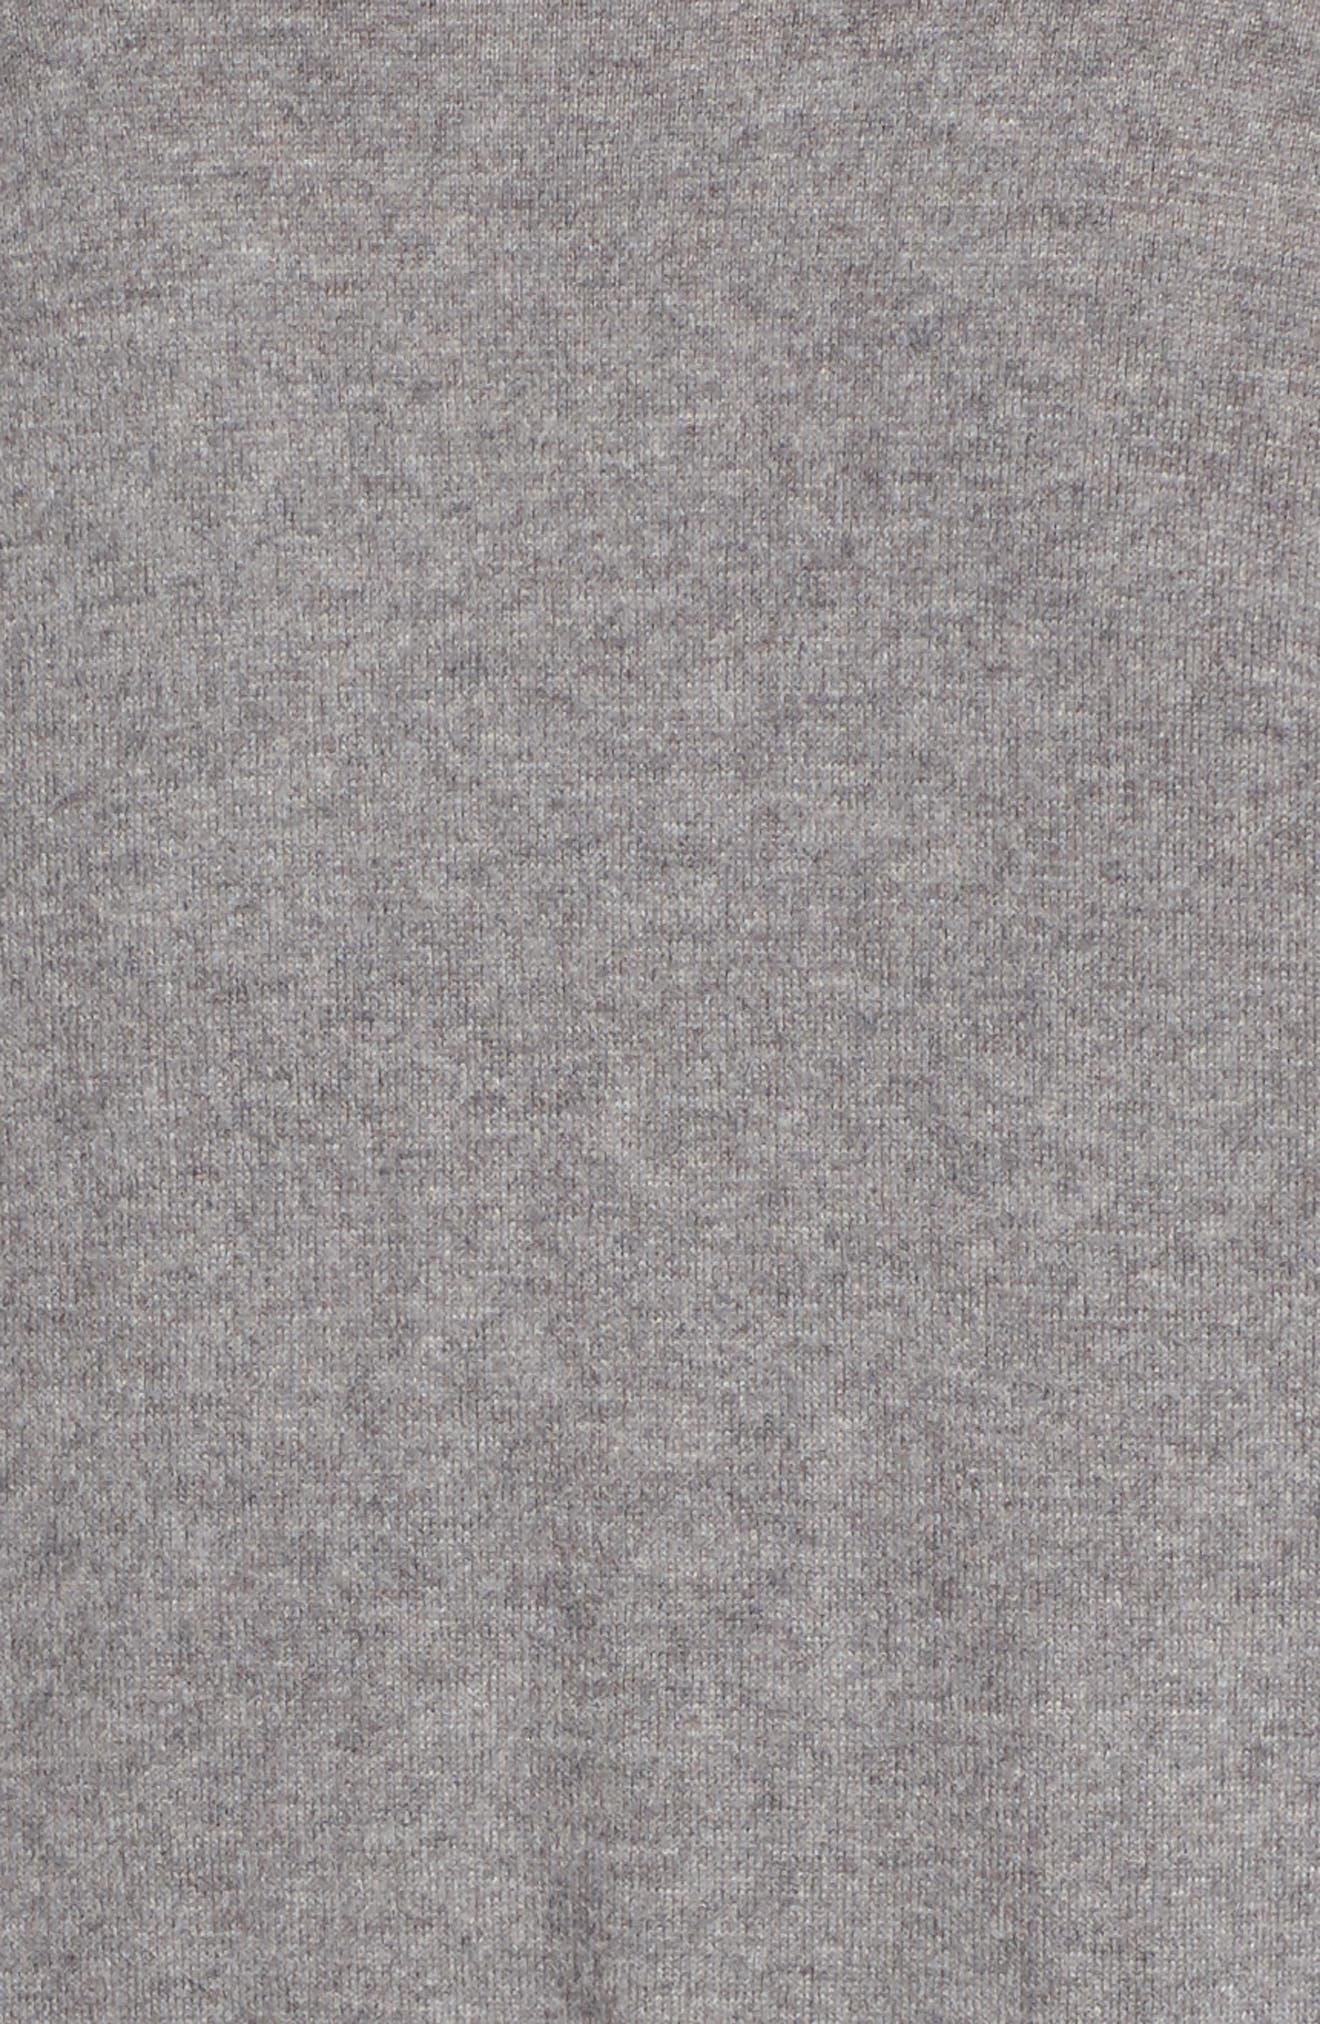 Boyfriend Turtleneck Sweater,                             Alternate thumbnail 14, color,